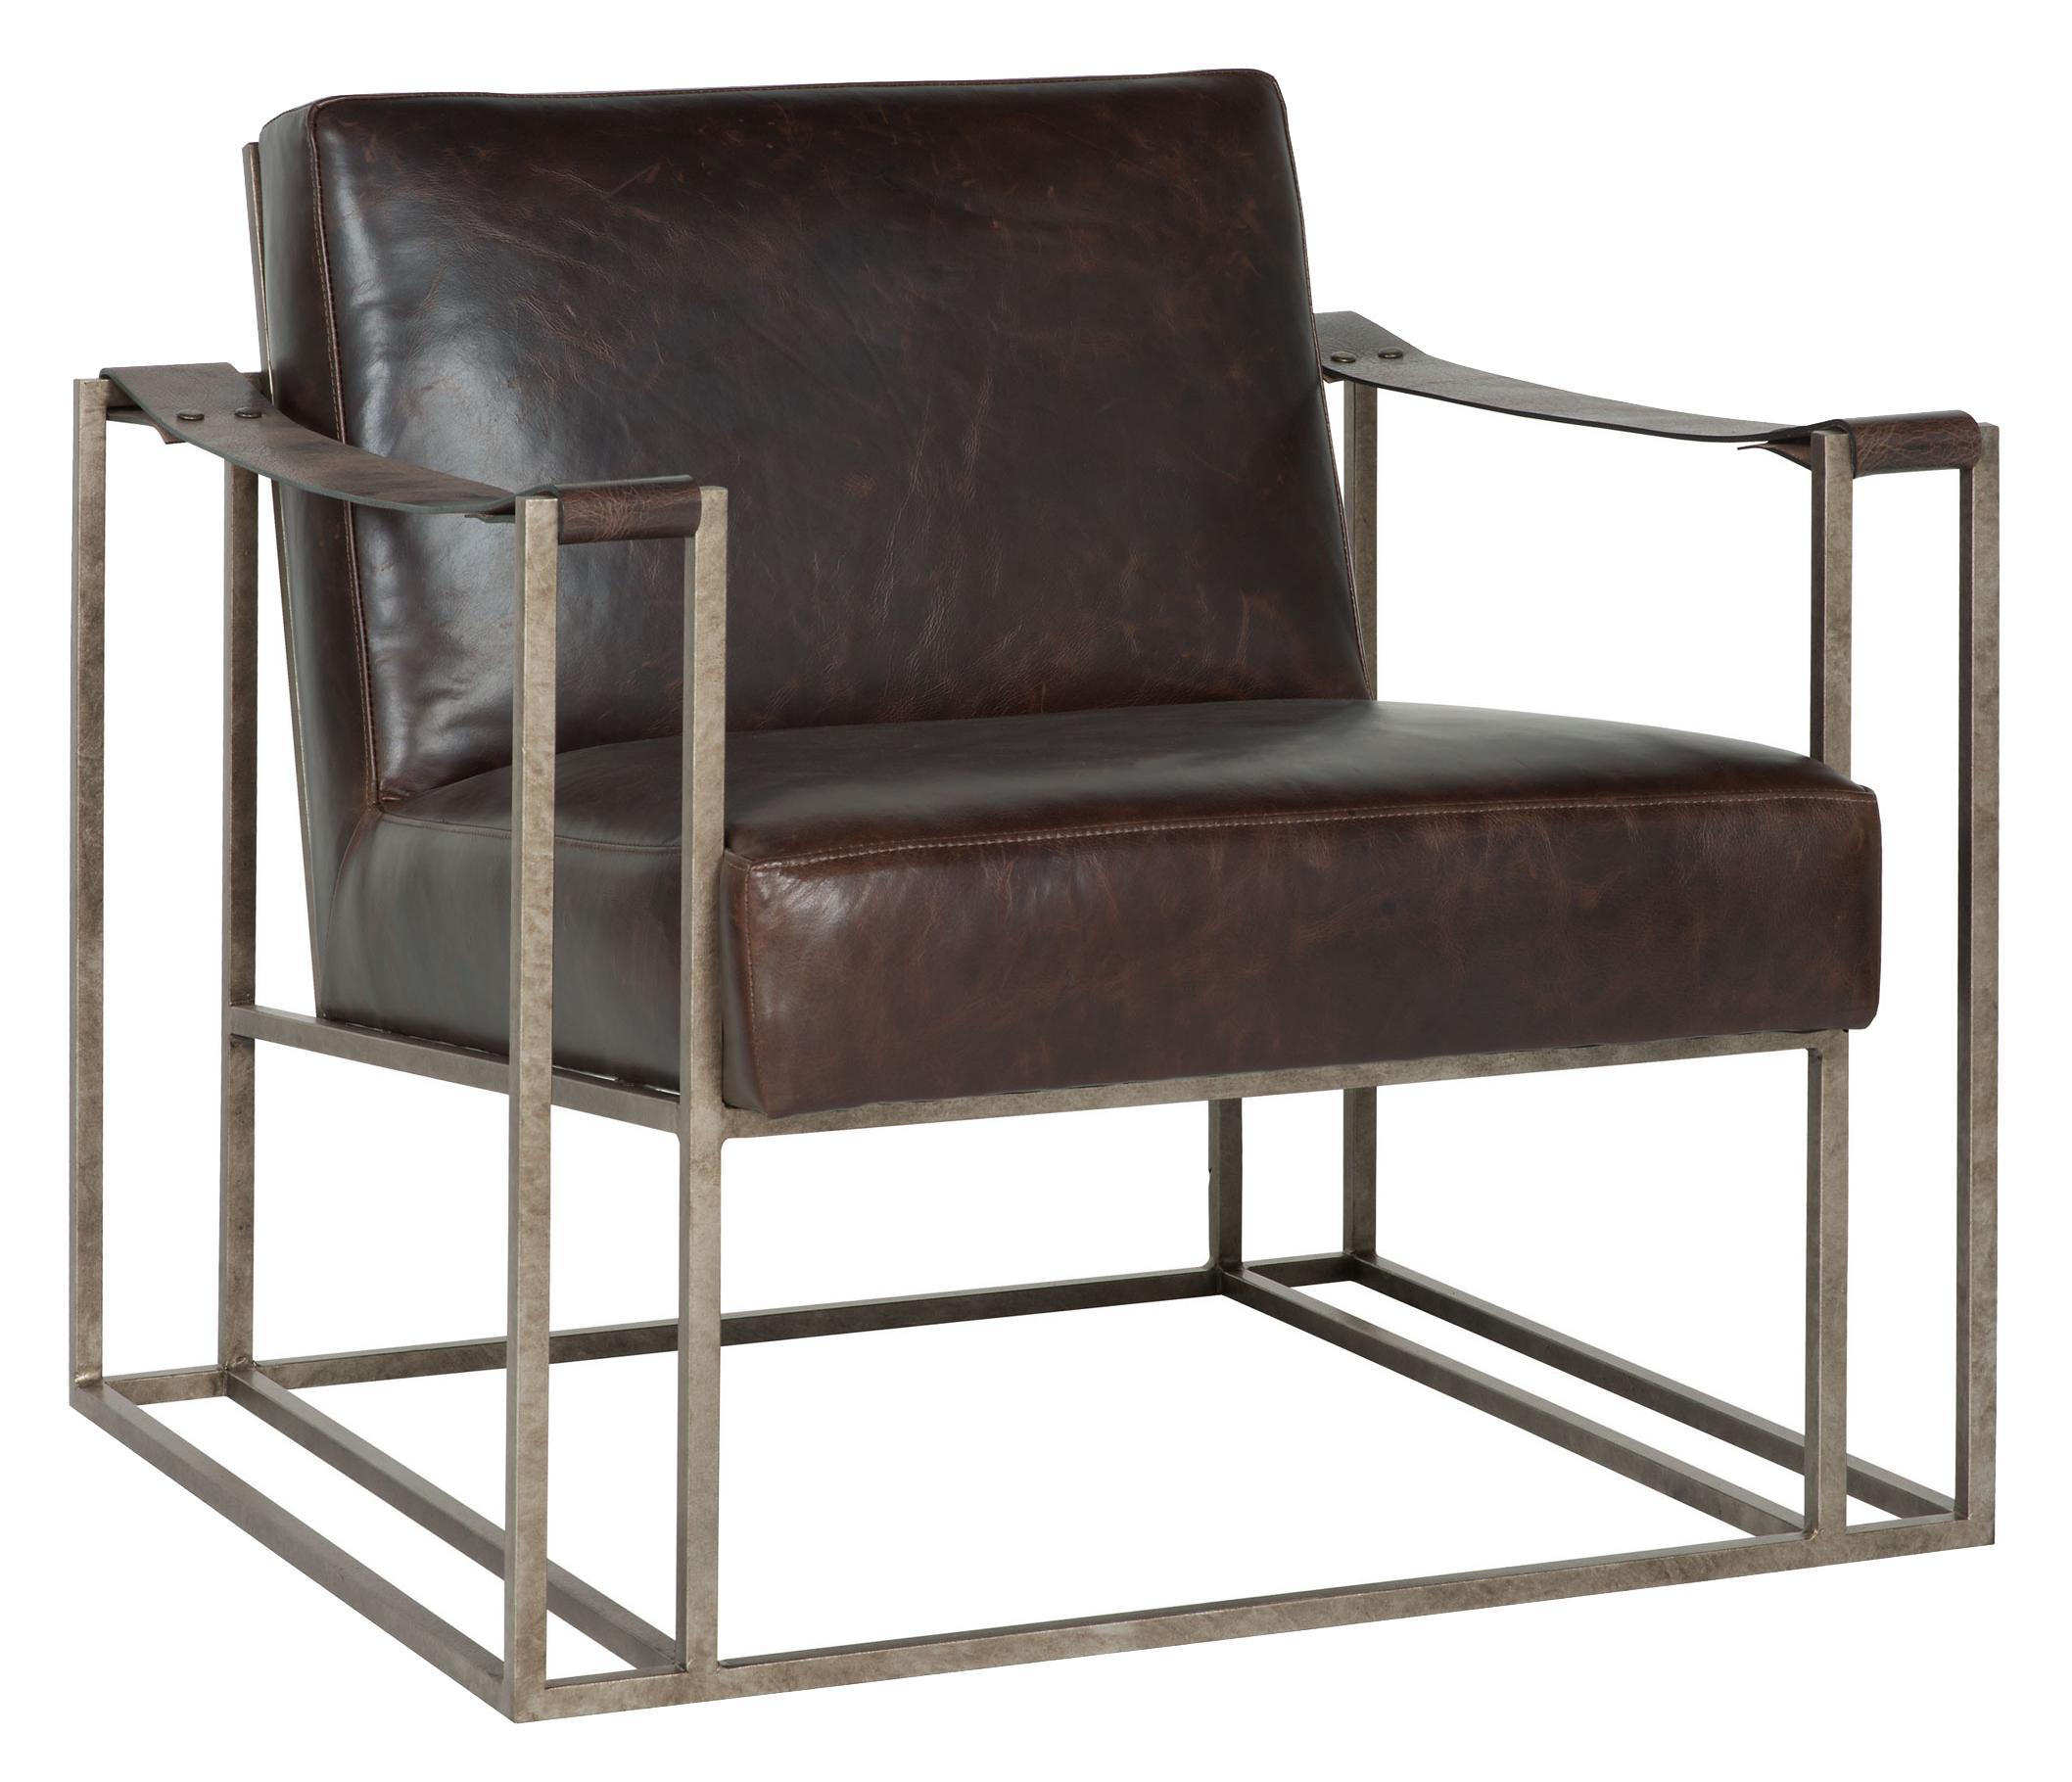 Attirant Bernhardt Dekker Dekker Industrial Leather Chair With Metal Arms